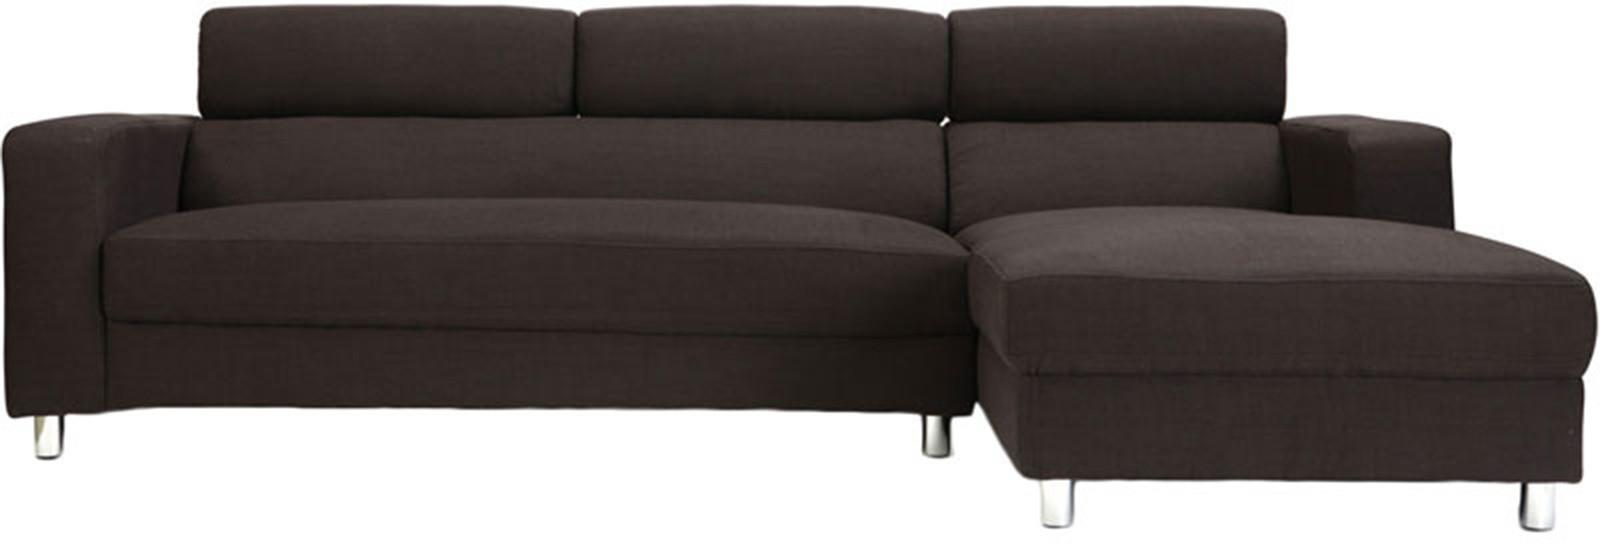 Deals - Bhopal - Sofa <br> Durian & More<br> Category - furniture<br> Business - Flipkart.com